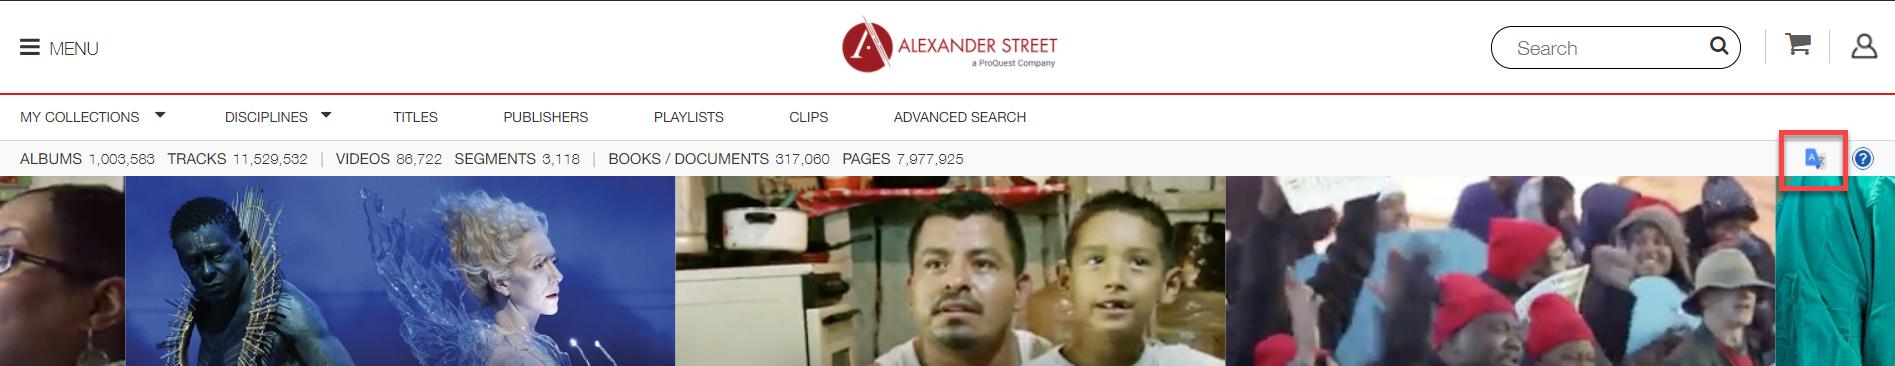 Box around Google Translate tool on Alexander Street Multimedia